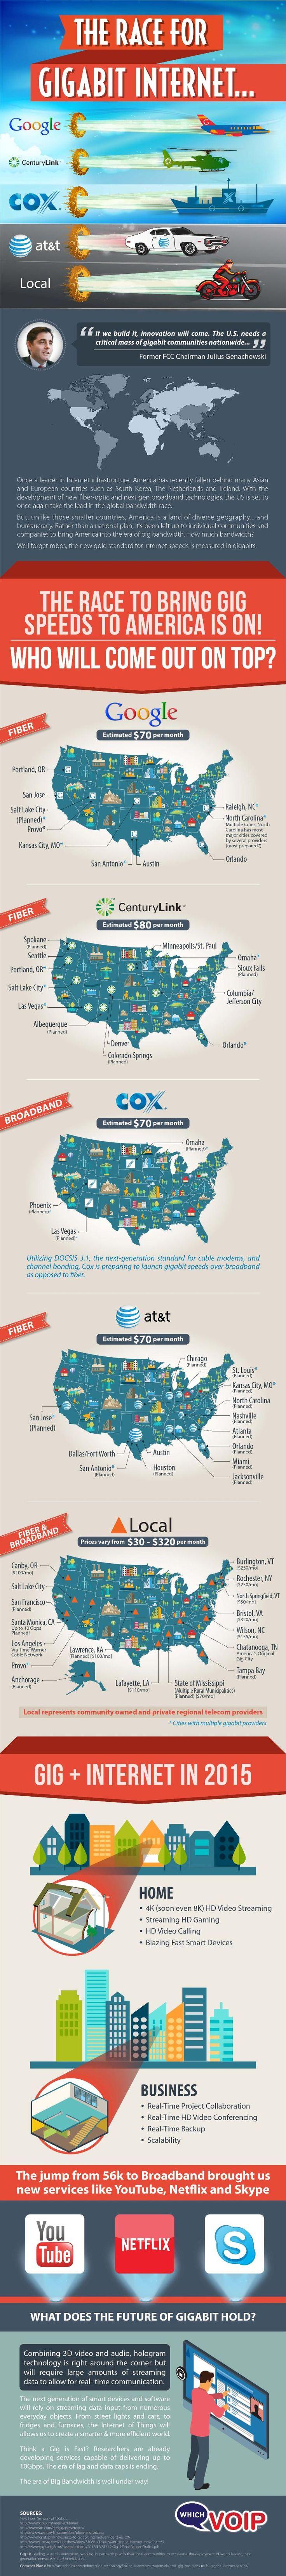 The Race for Gigabit internet #infographic #Internet #Technology